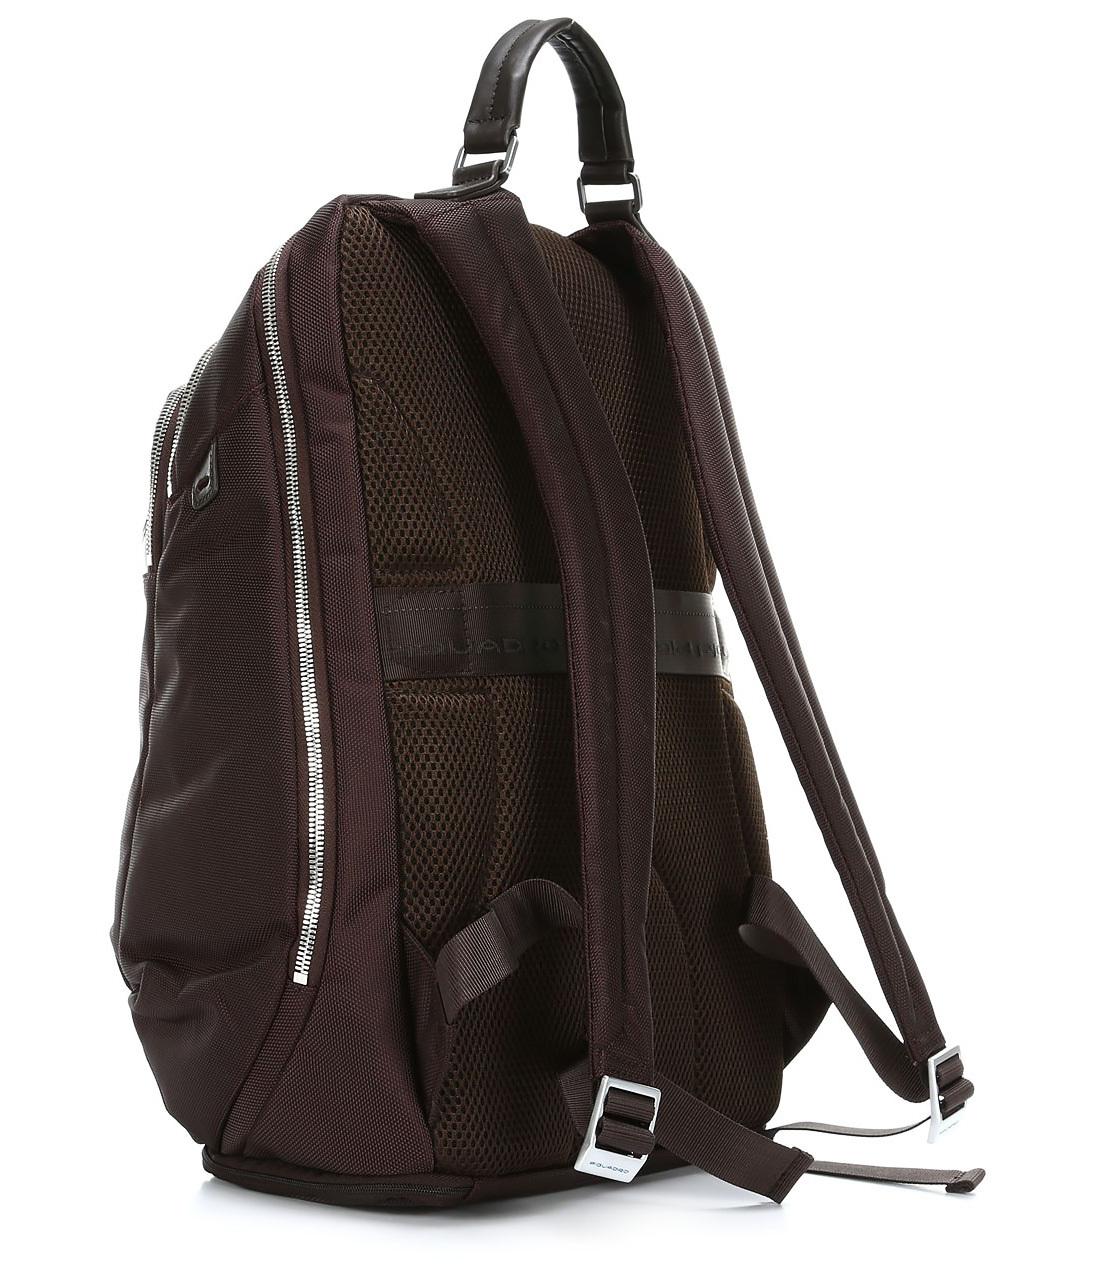 Рюкзак Piquadro Link, цвет коричневый, 33х42х19 см (CA2961LK/TM)